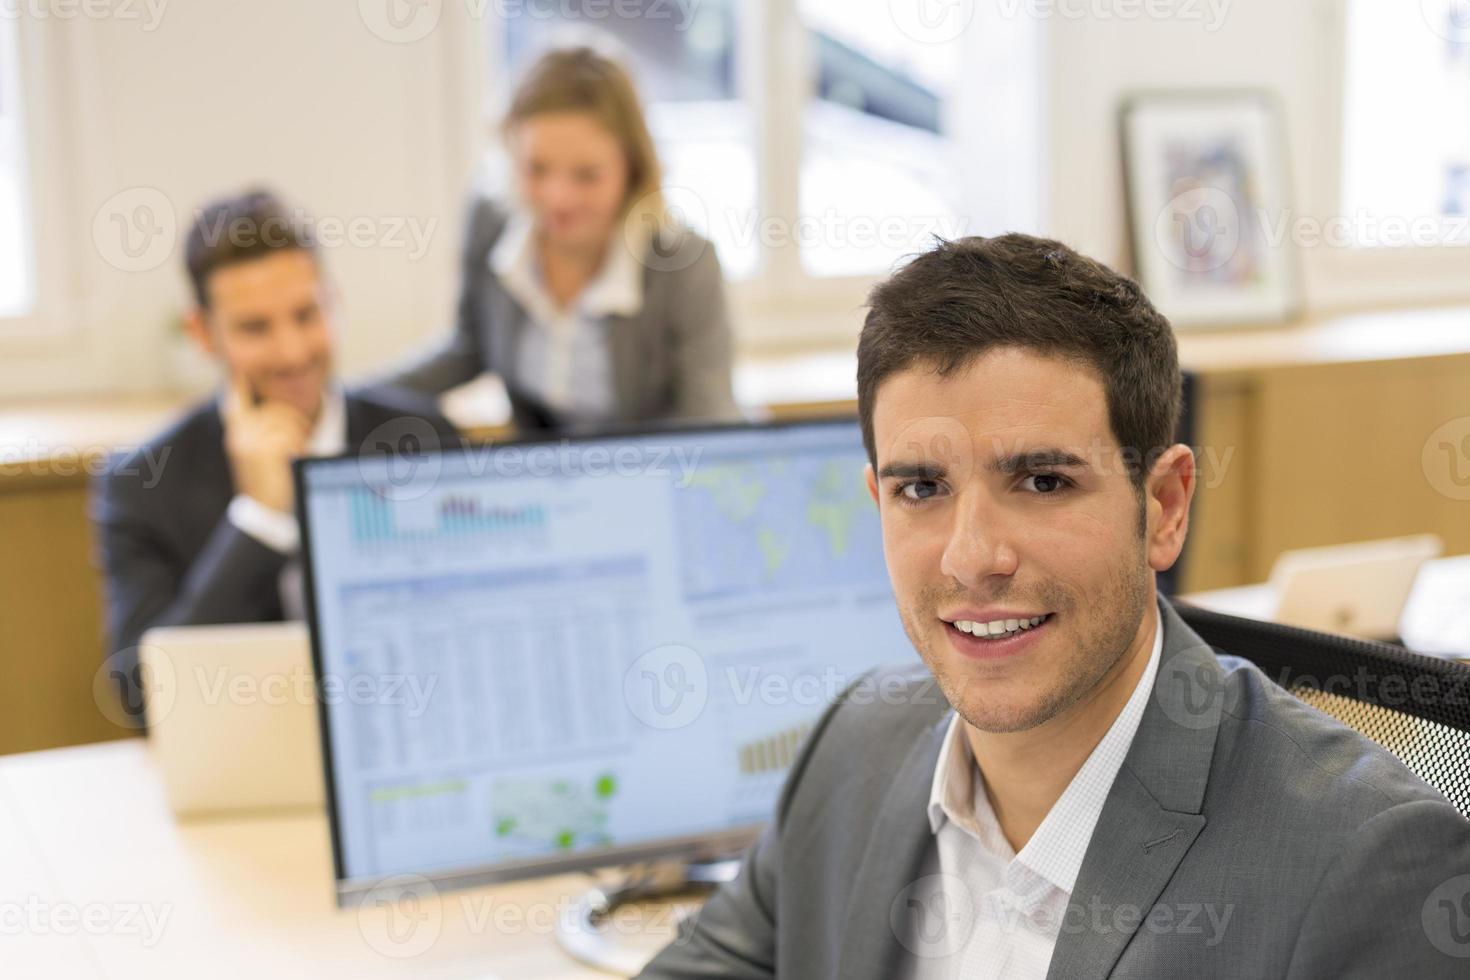 portret van knappe zakenman in moderne kantoren. uitziende camera foto